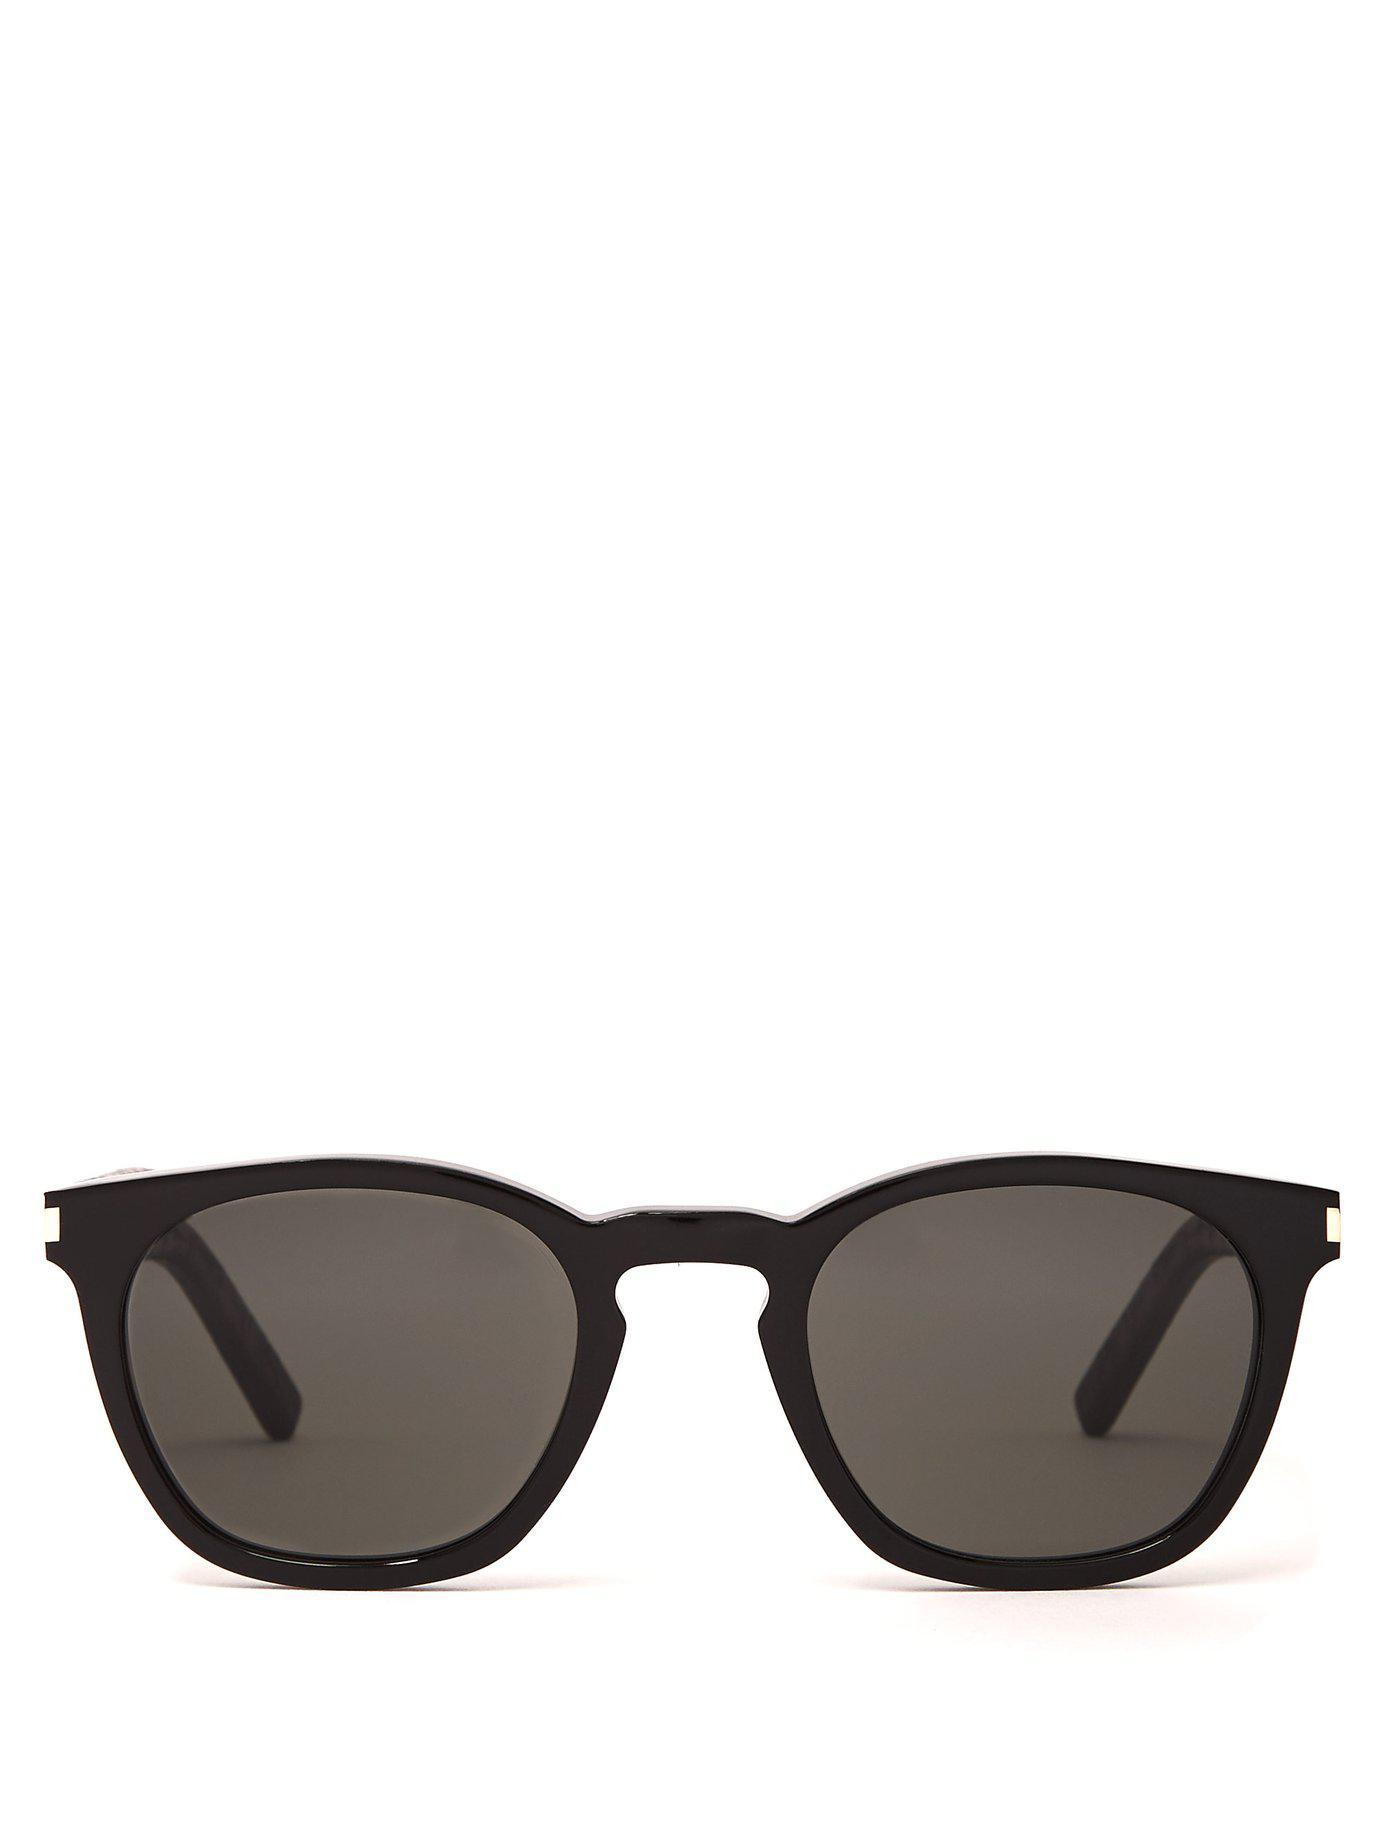 e3432642b66e Lyst - Saint Laurent Round Acetate Sunglasses in Black for Men